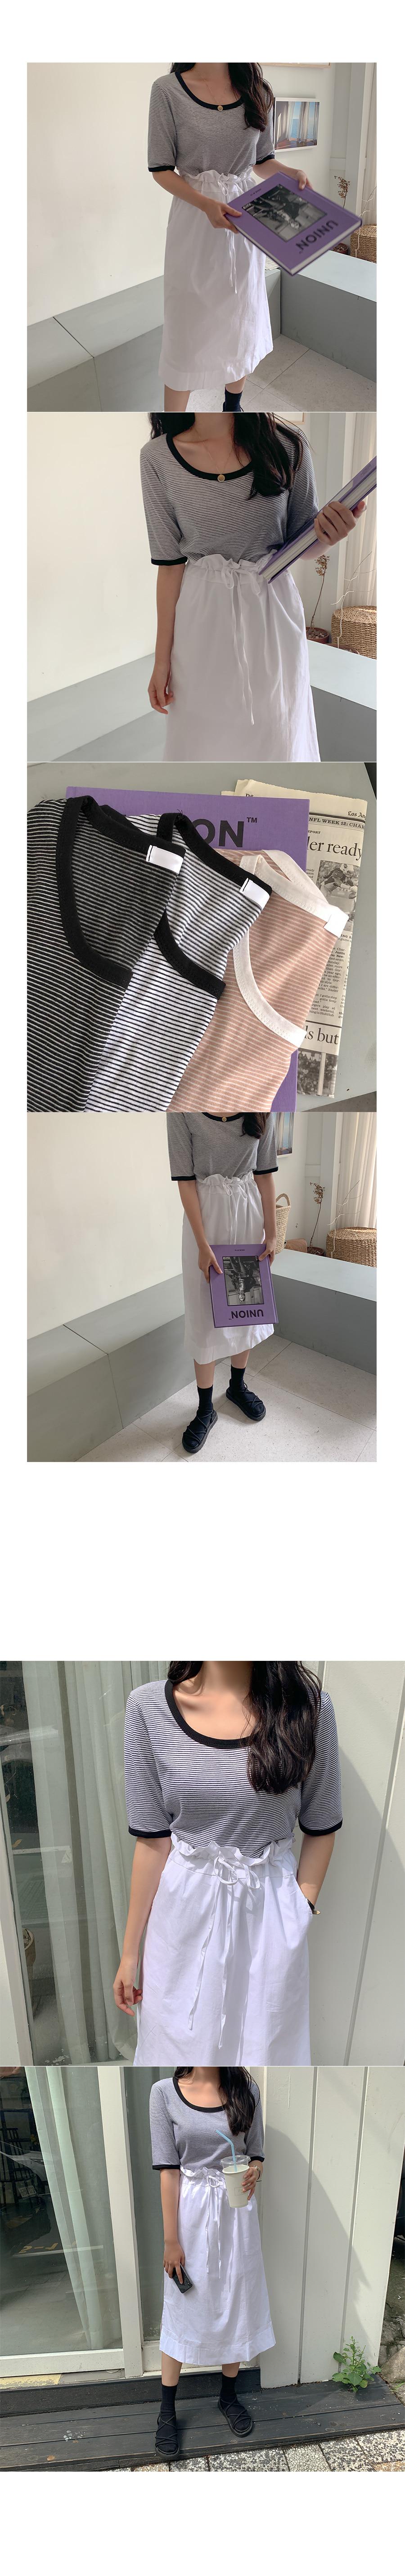 Newdie string skirt